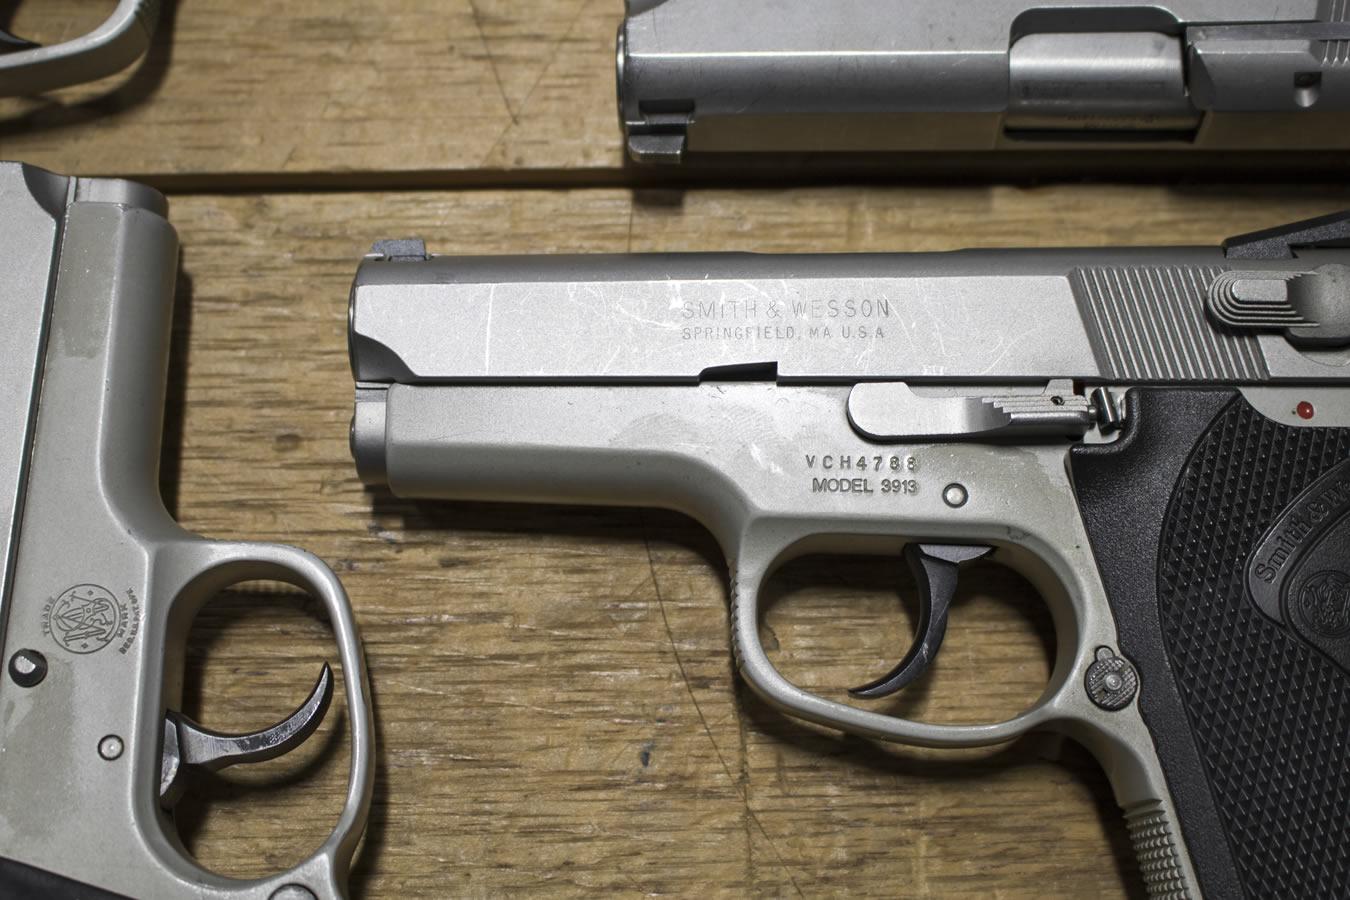 3913 9mm Police Trade-in Pistols (Fair Condition)